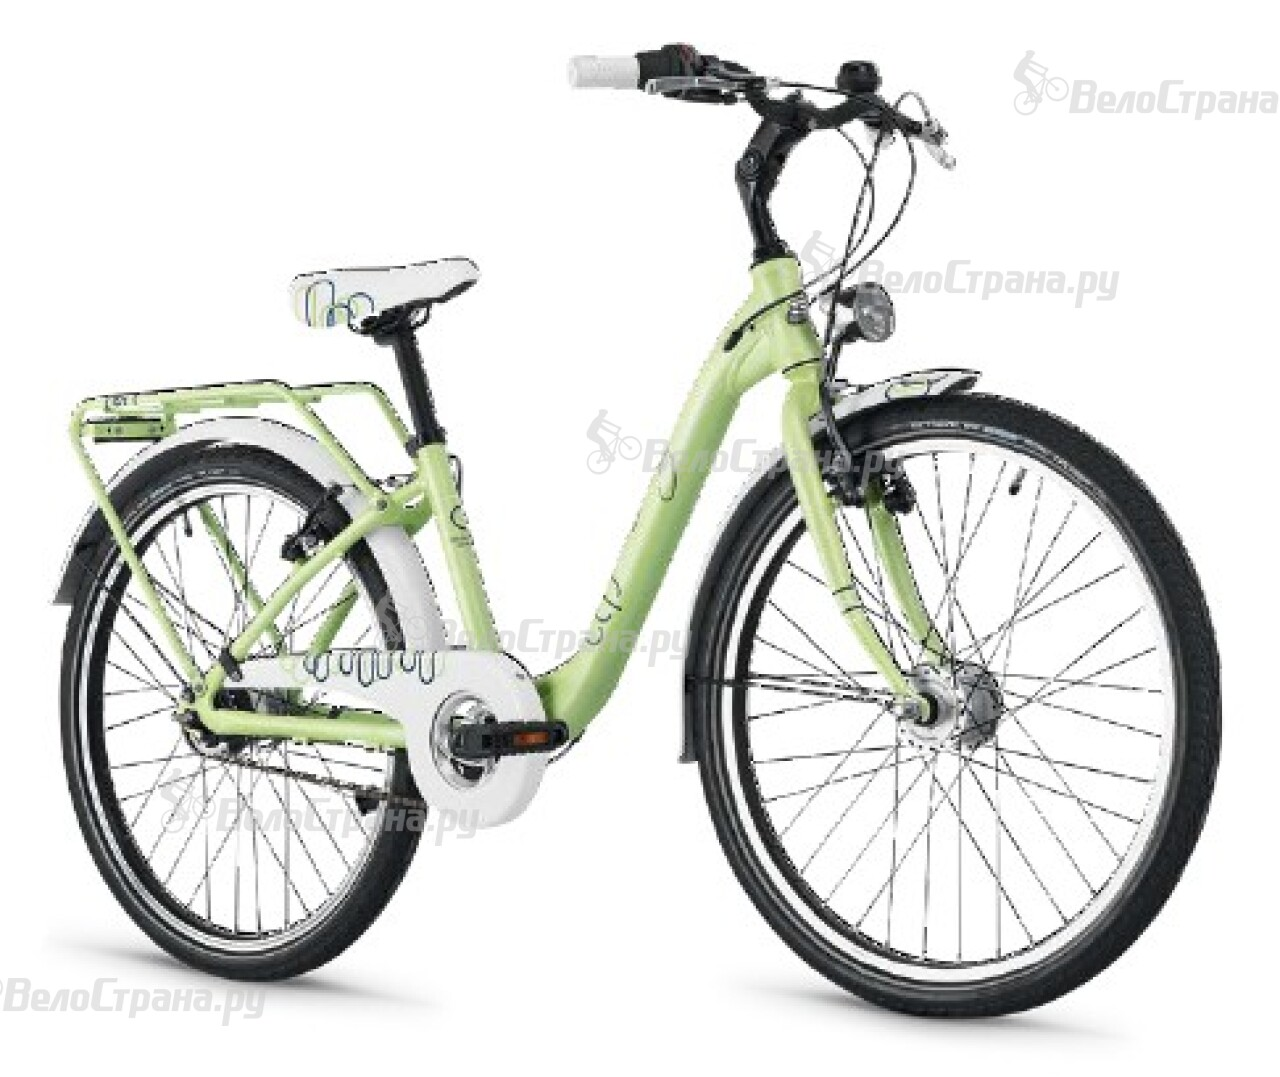 Велосипед Scool ChiX 24 7S (2014) велосипед scool chix pro 24 24 s 2016